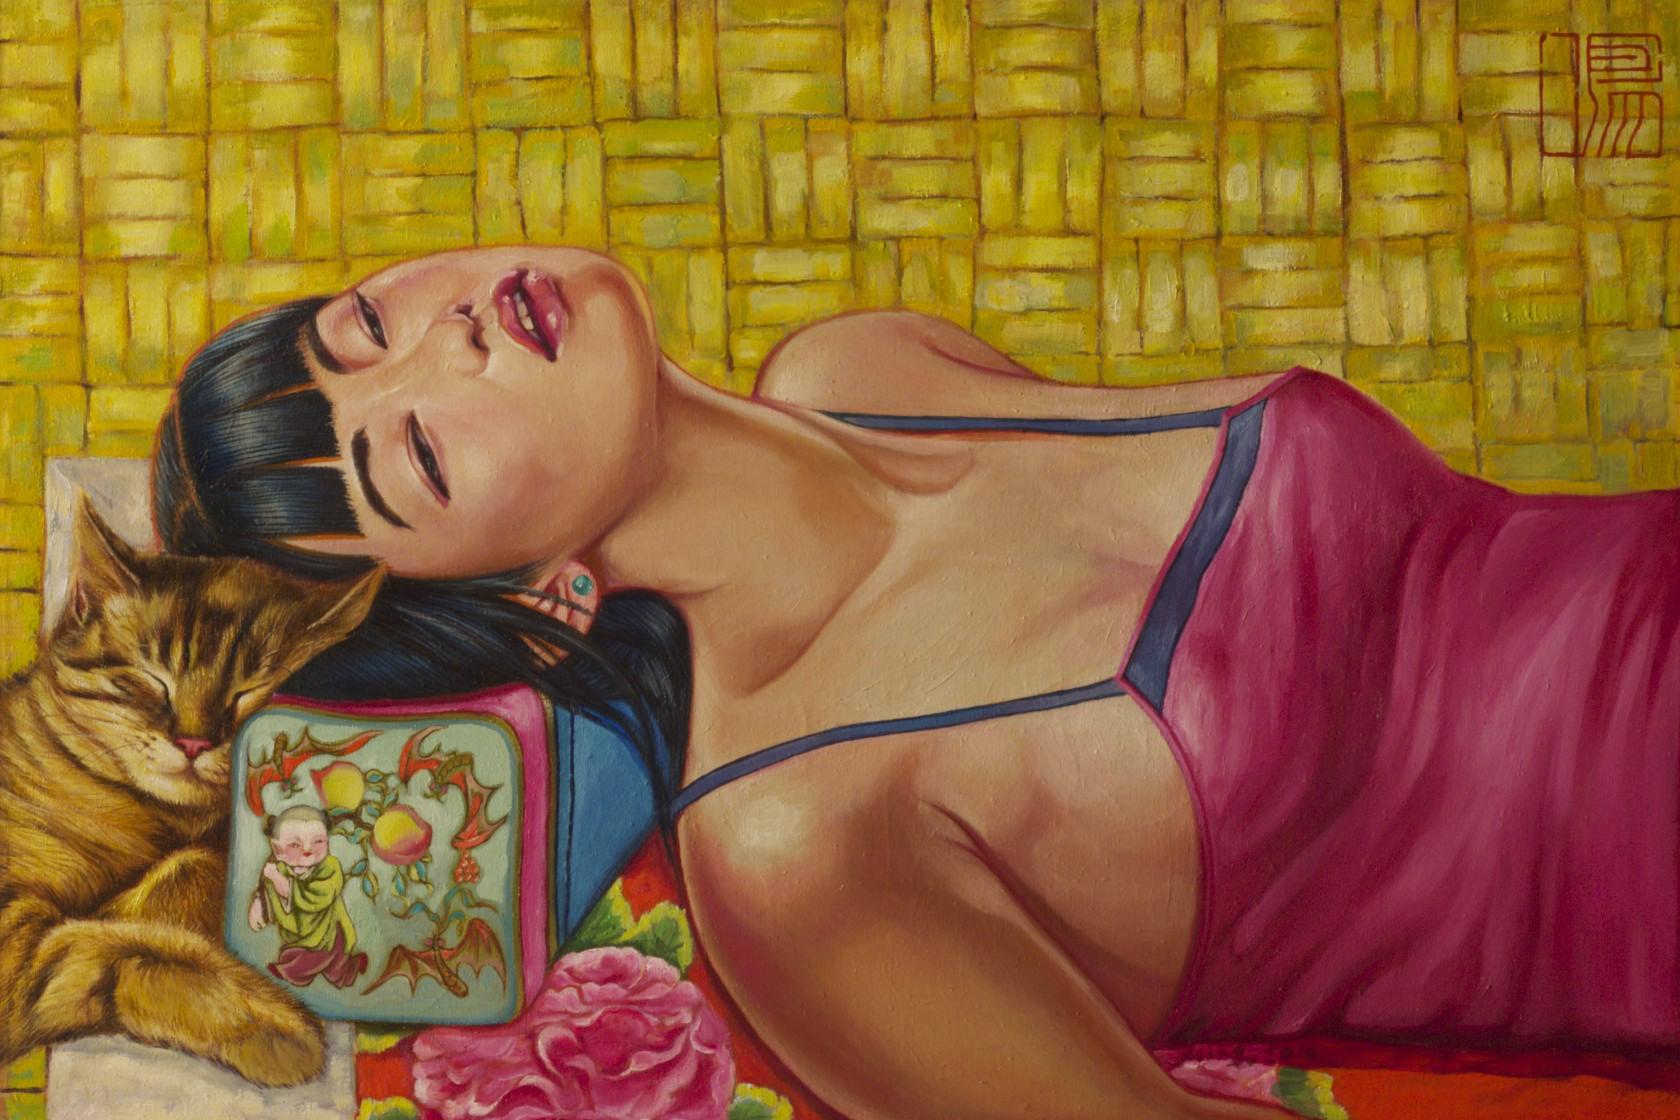 #14584 Hu Ming 'Resting' Oil on Canvas 56cm x 71cm $7800